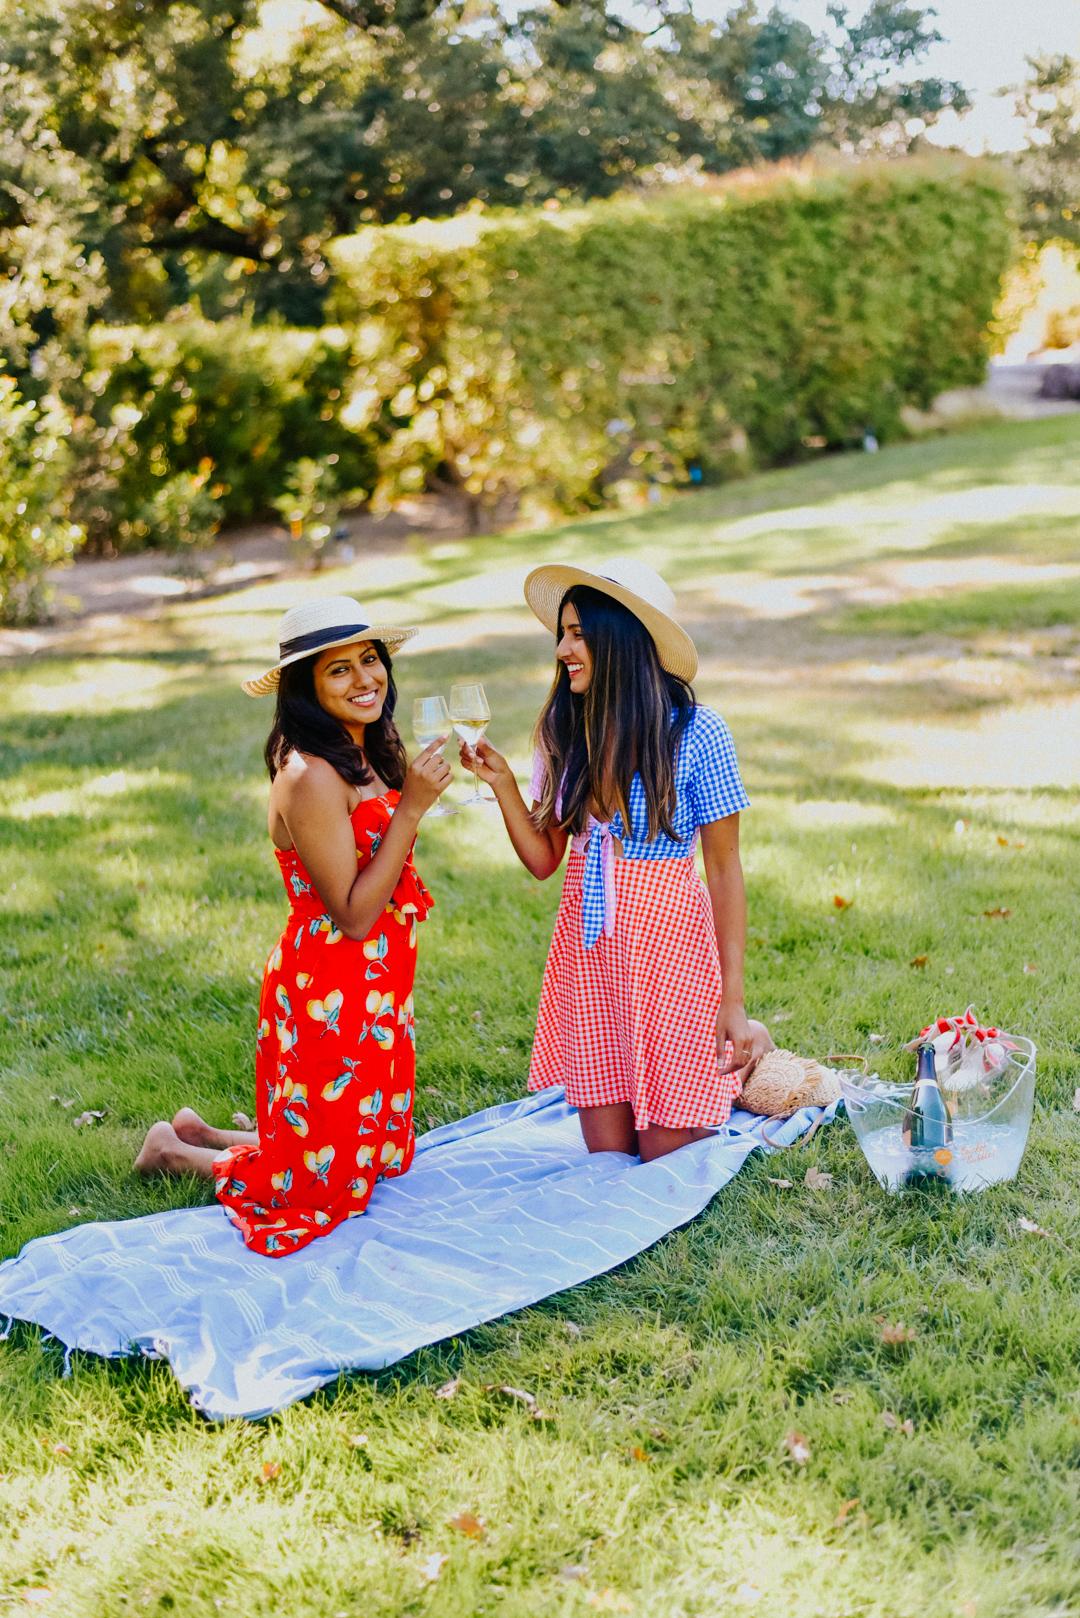 Napa-valley-roadtrip-california-sisters-summer 4